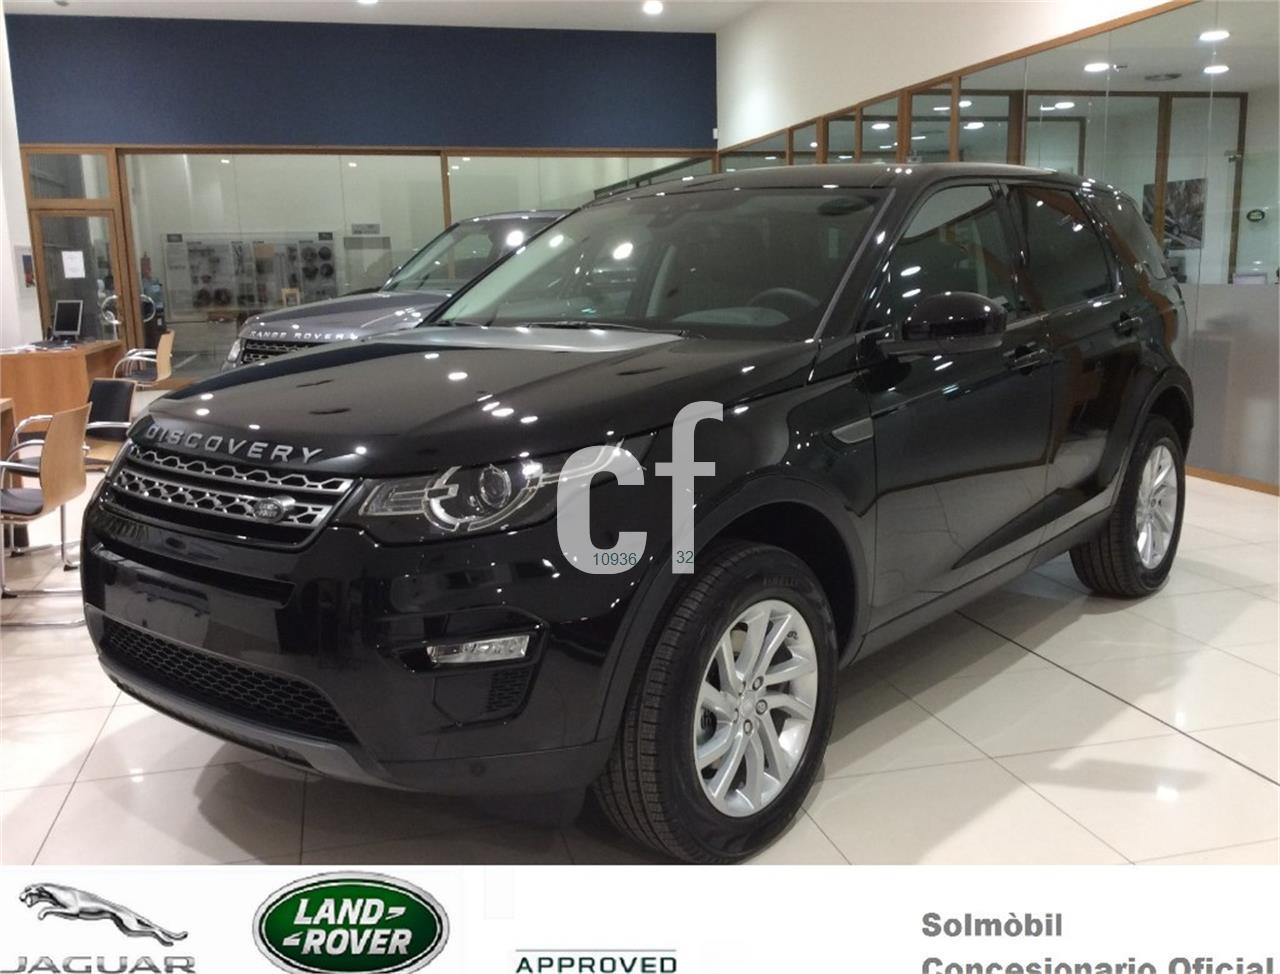 LAND-ROVER Discovery Sport de venta de venta por 56695